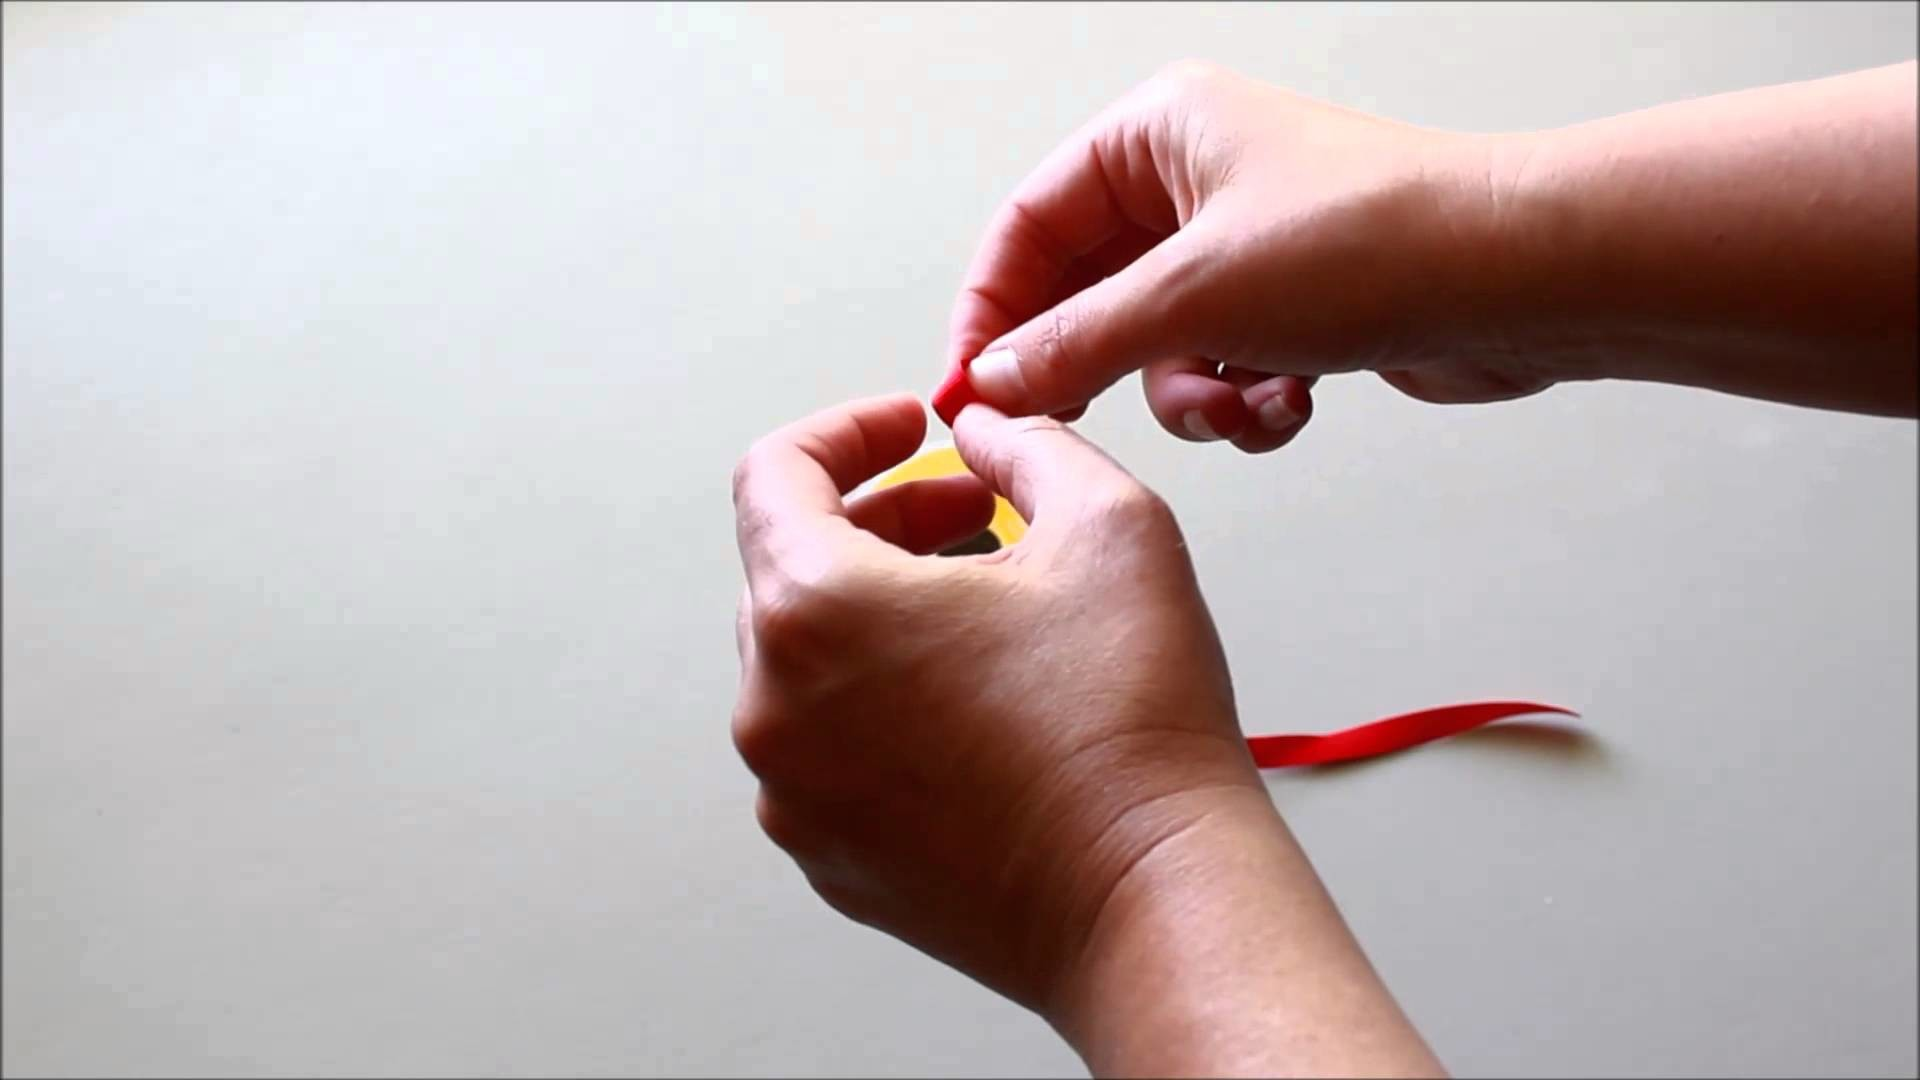 DIY Accessories - Bow Tie Necklace - Disneybound: Donald Duck